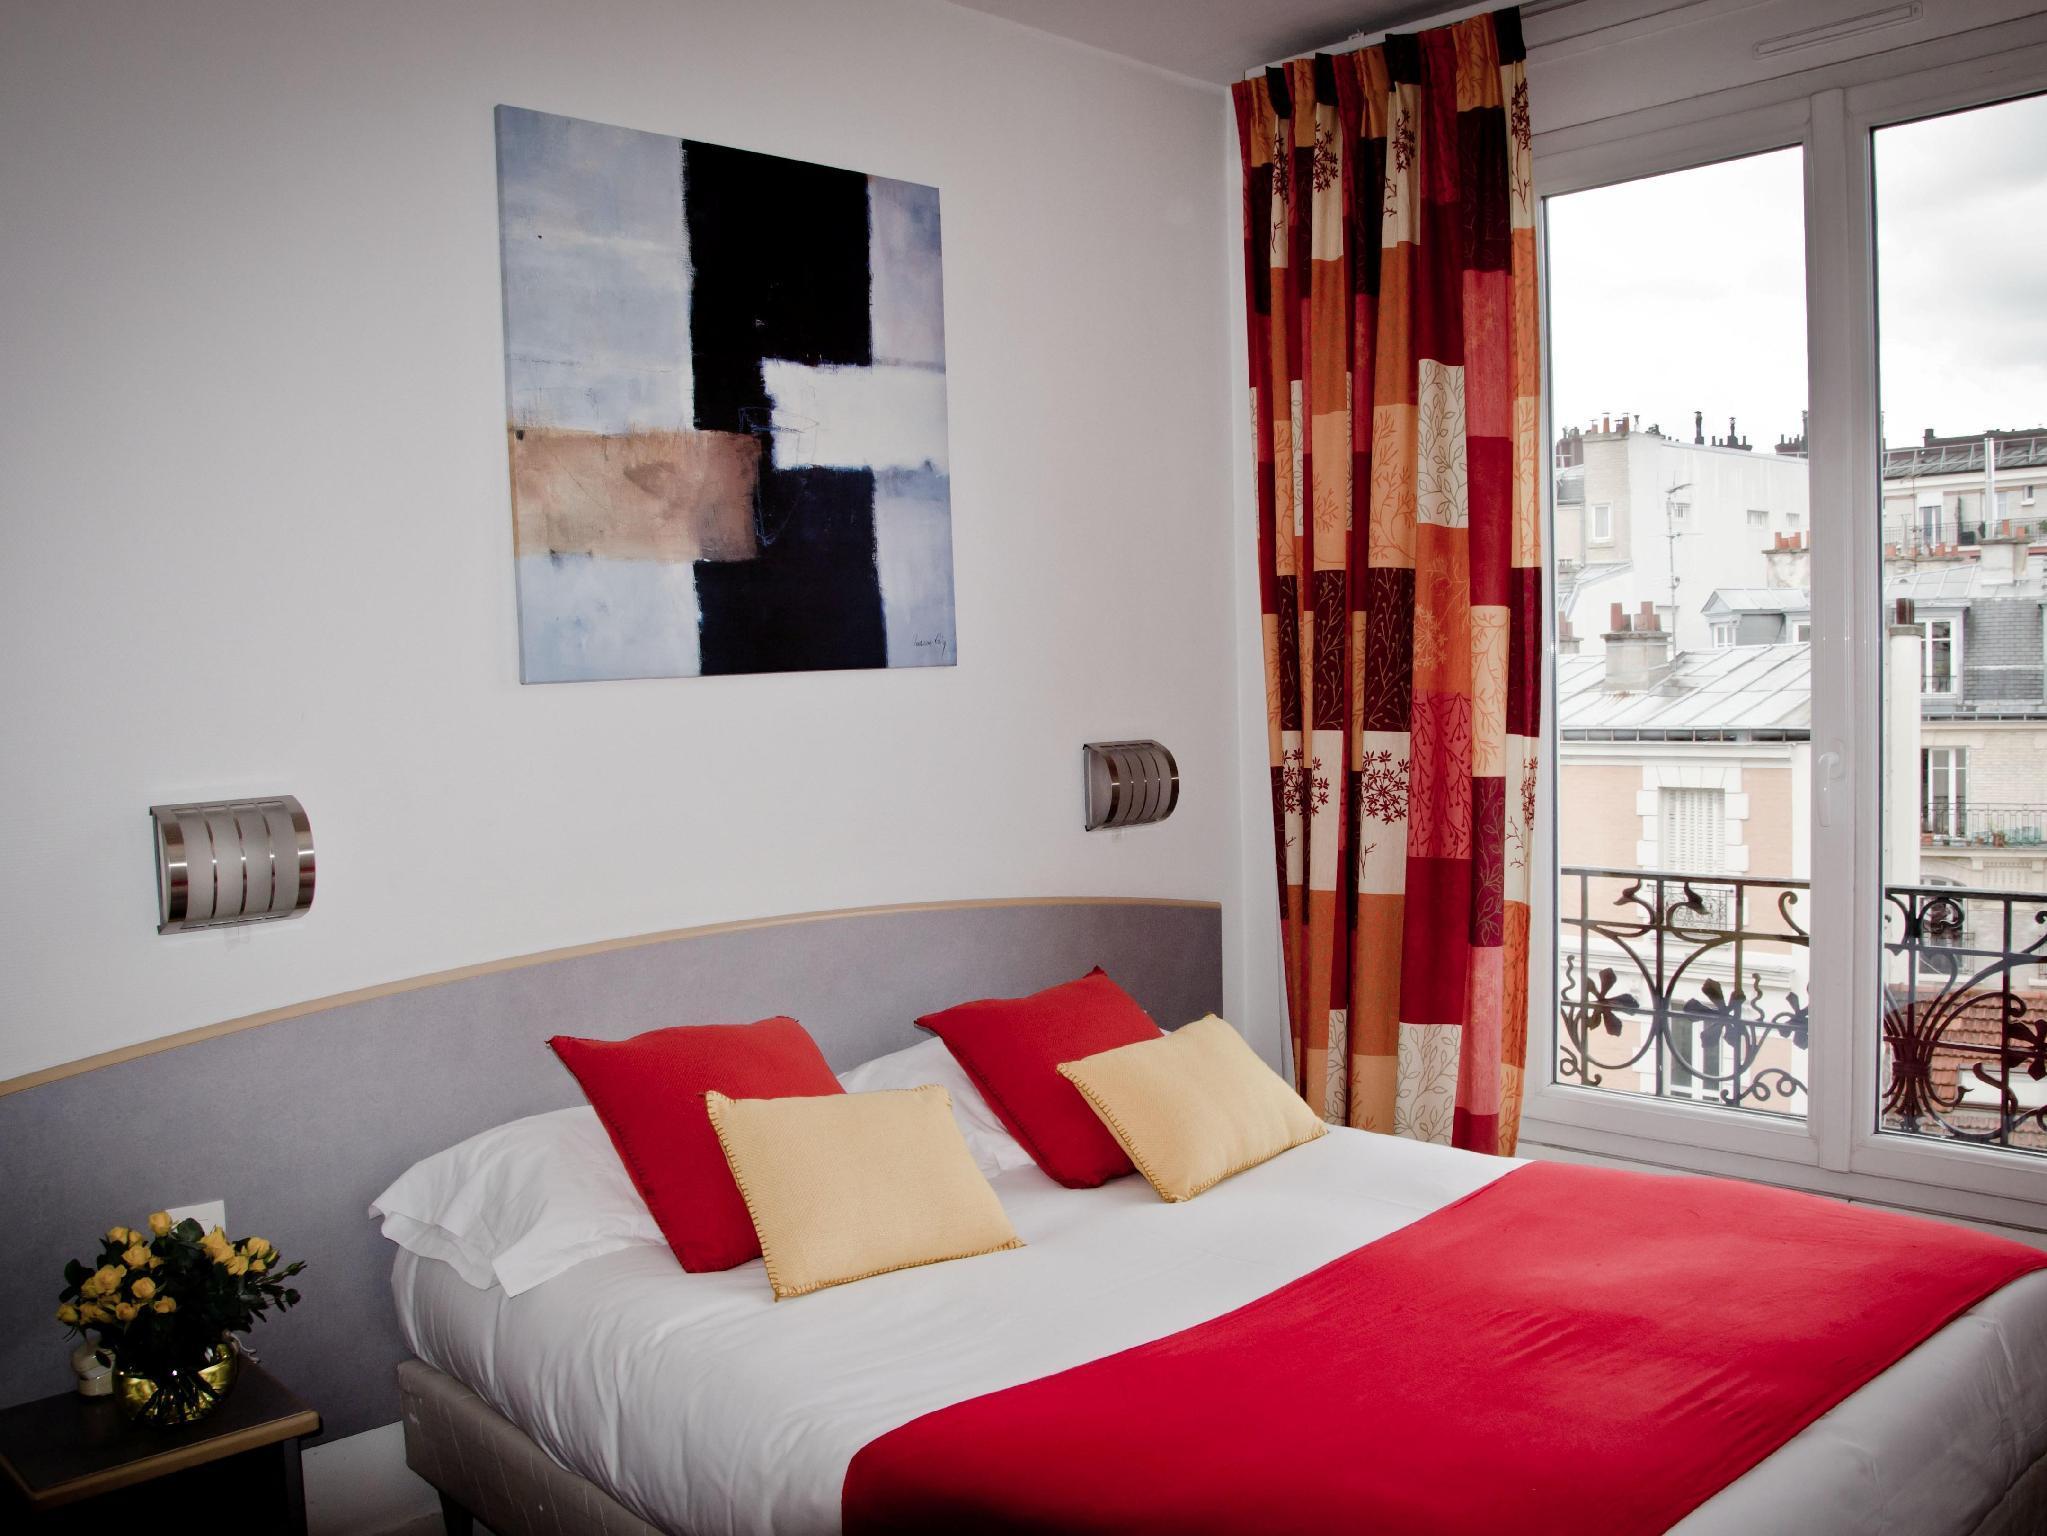 Hotel Chouette